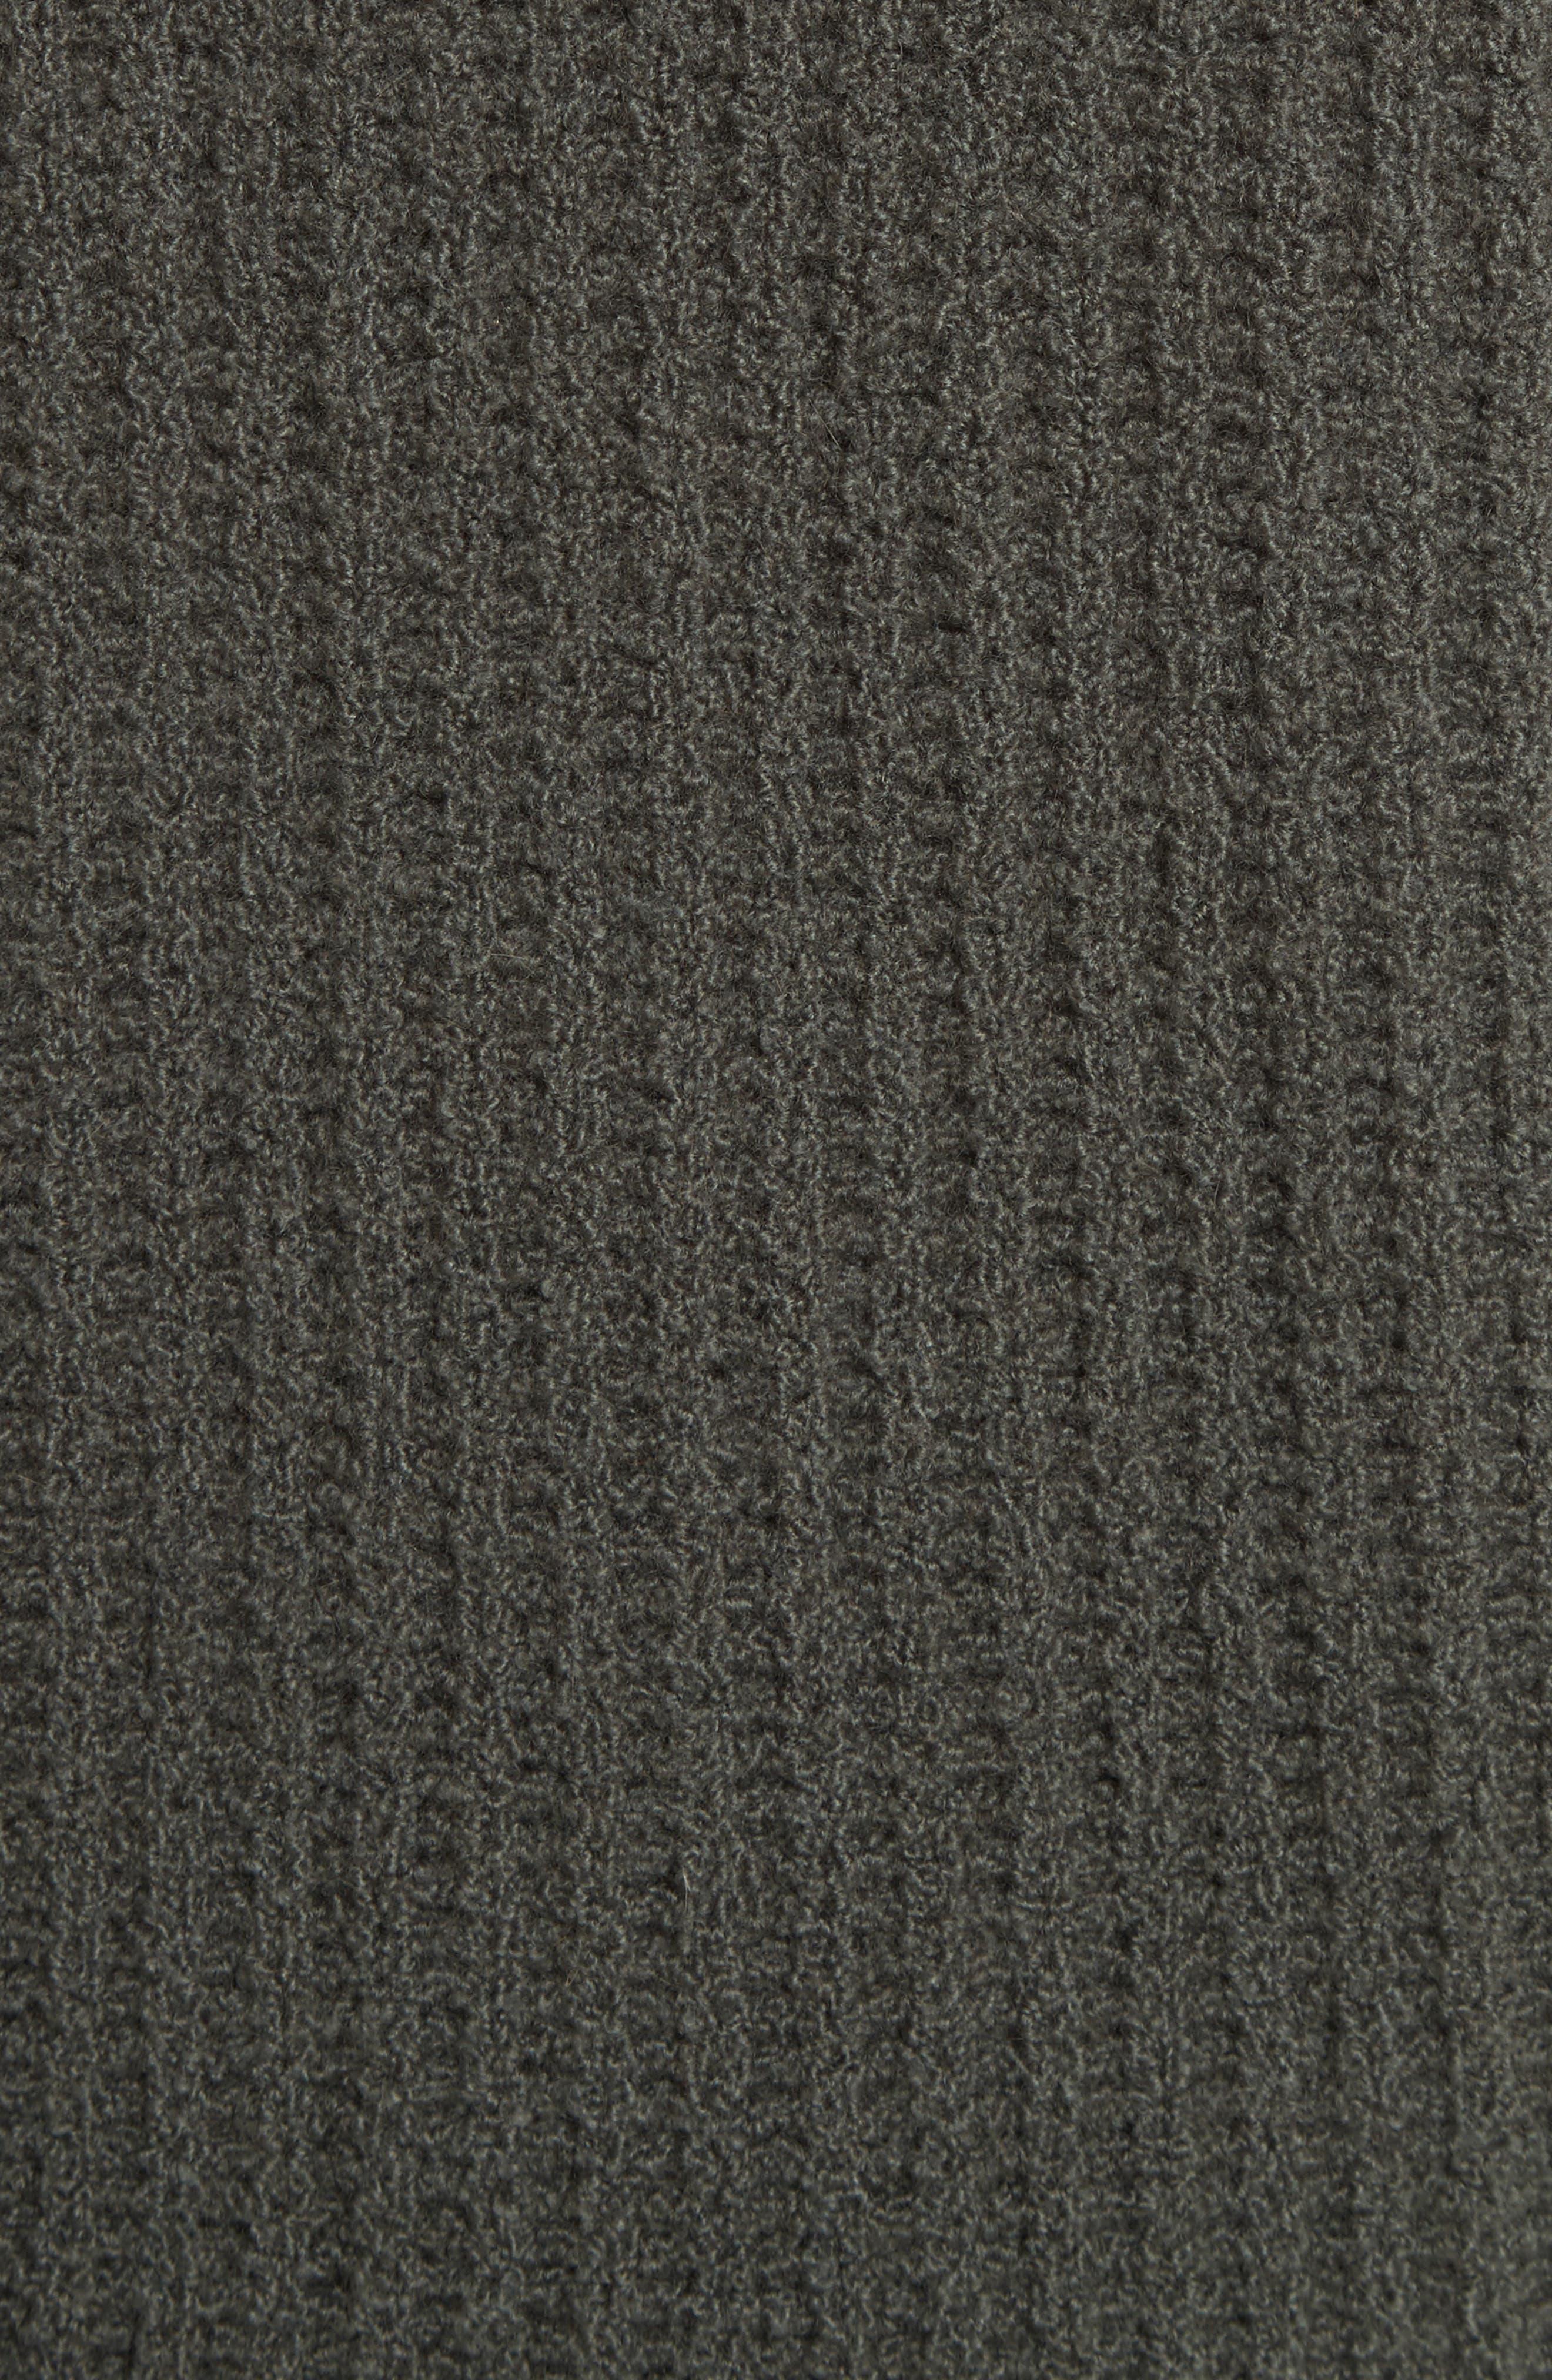 Deep V-Neck Cashmere Blend Sweater,                             Alternate thumbnail 14, color,